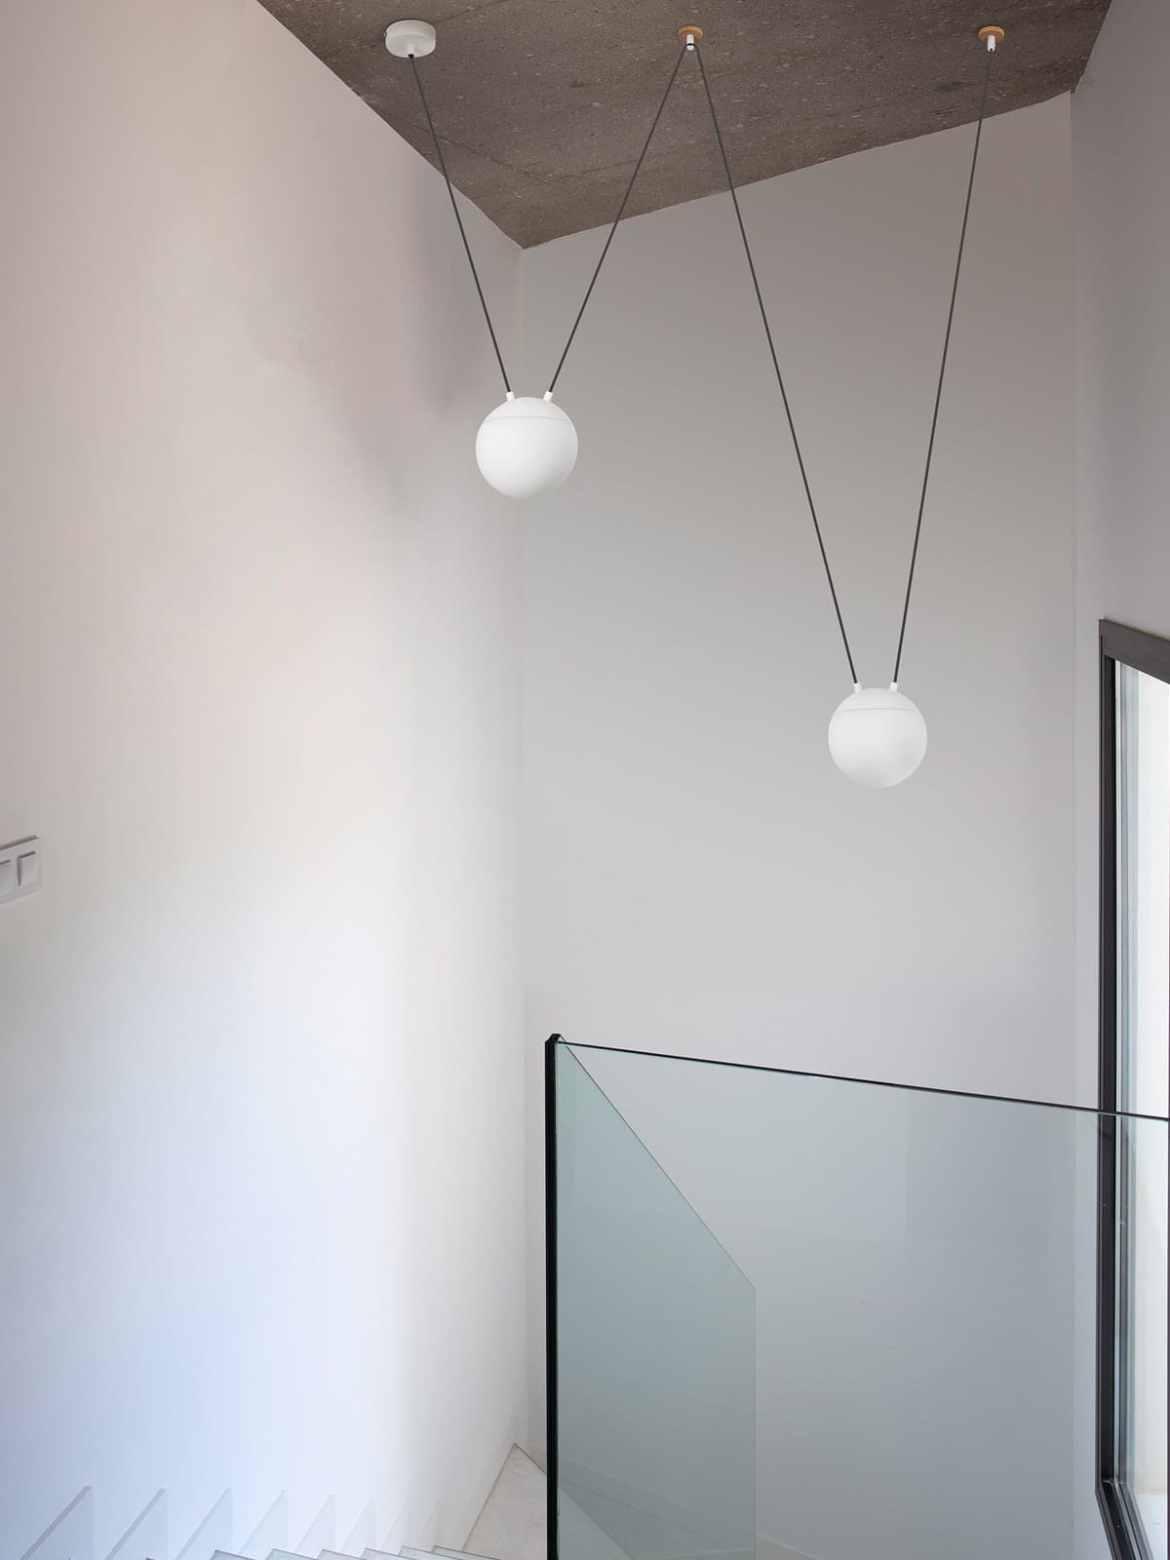 DesignOrt Blog: Kugelige Pendelleuchten Mine Space Pendel Lampe Faro Barcelona